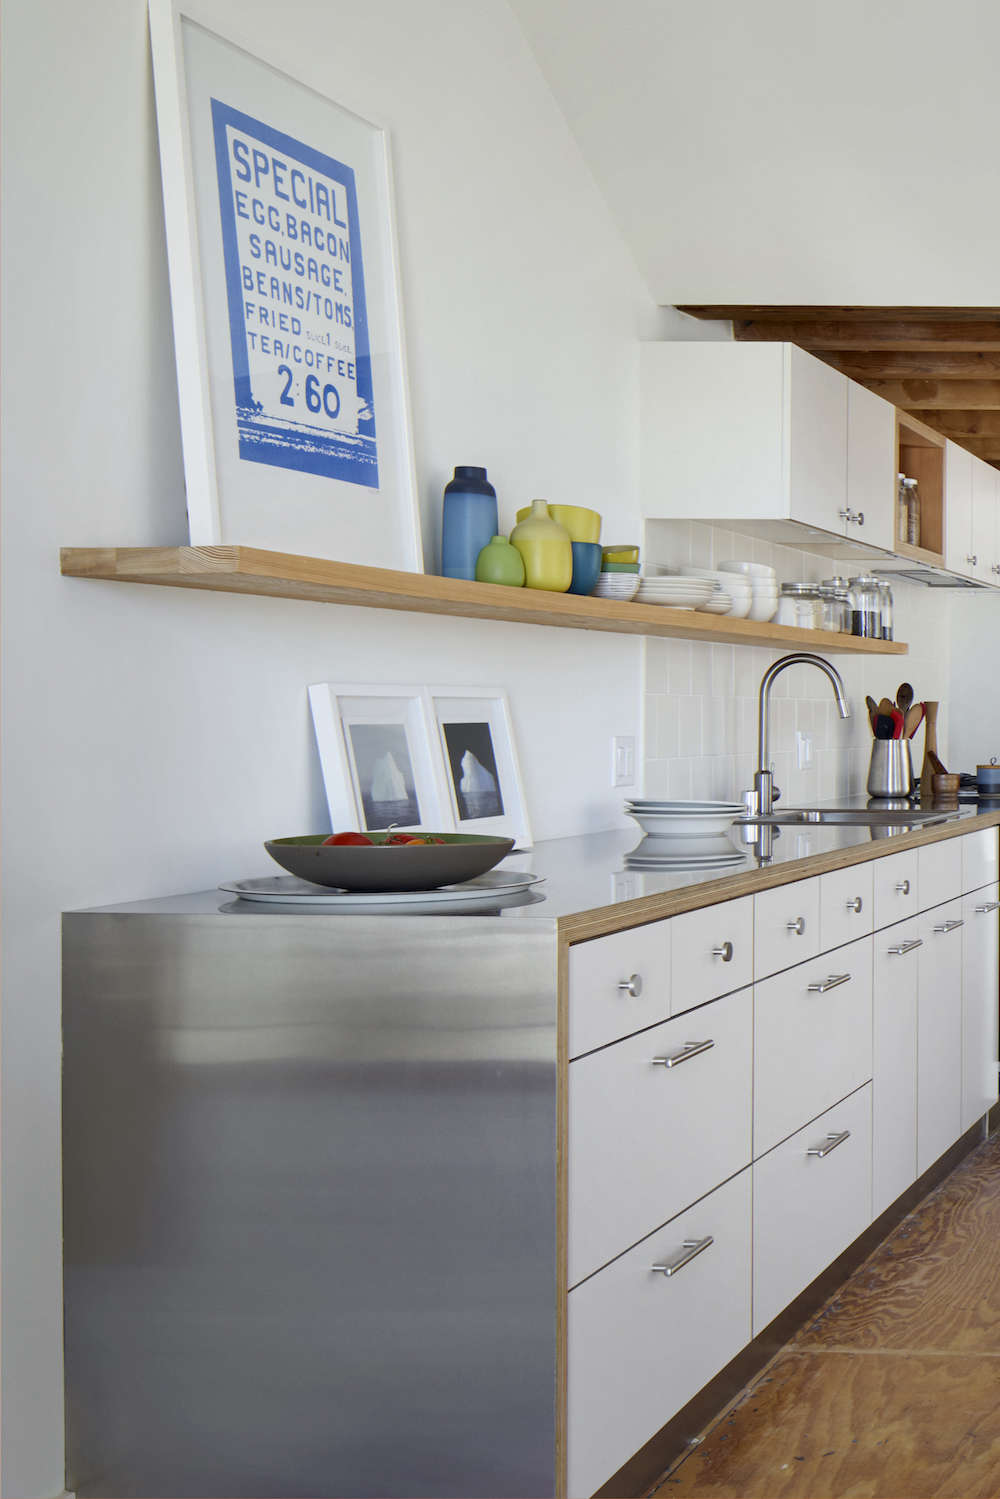 Remodeling 101: Stainless Steel Countertops | Remodelista ...